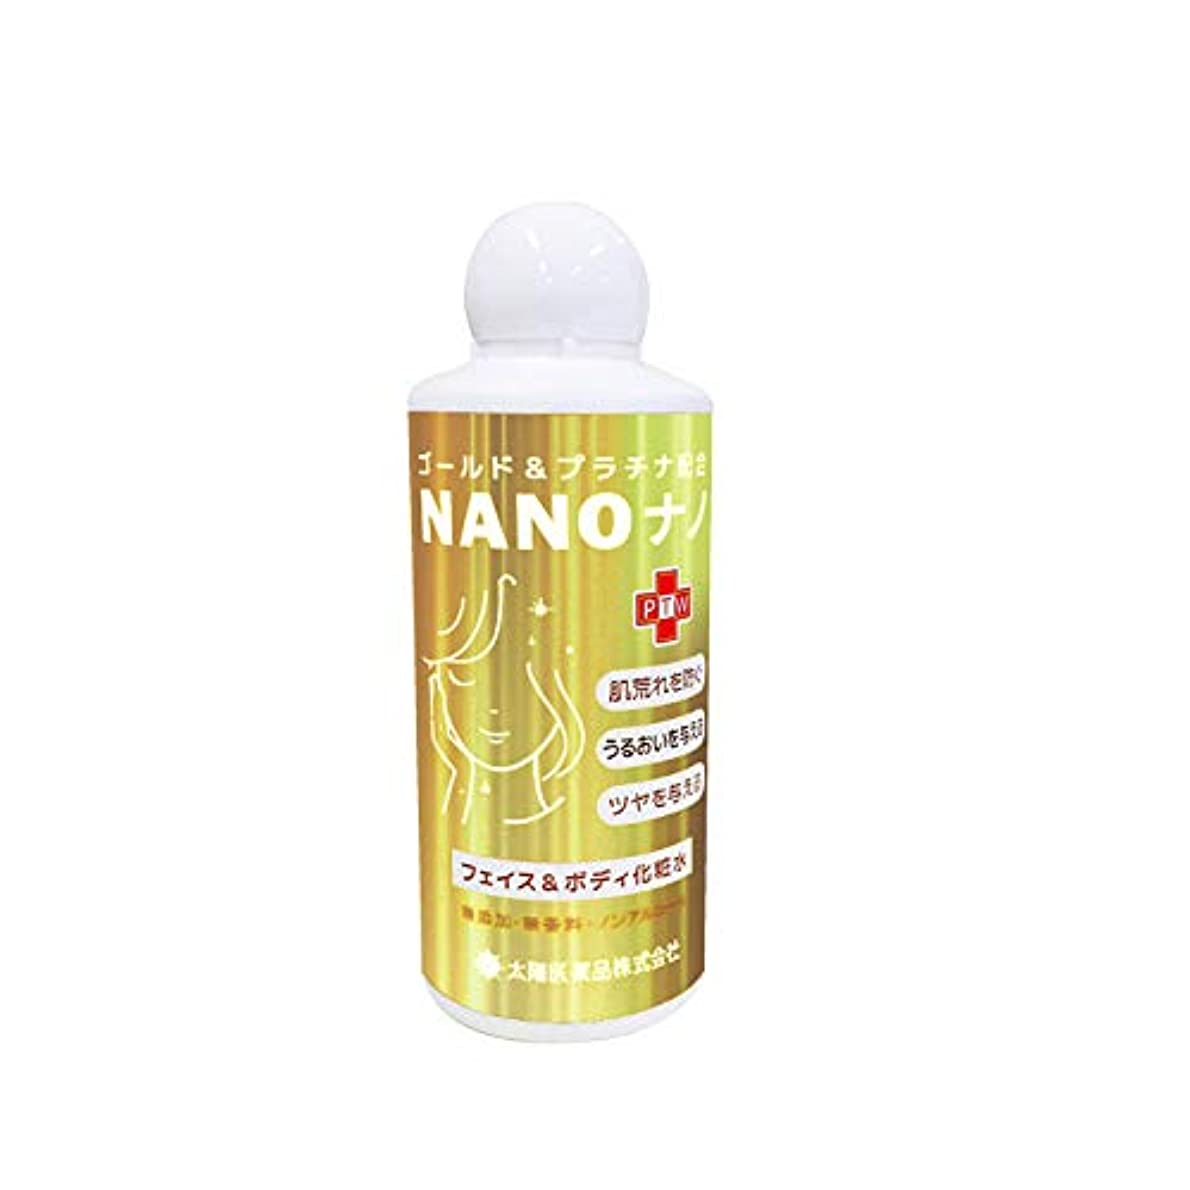 NANO フェイス&ボディ化粧水